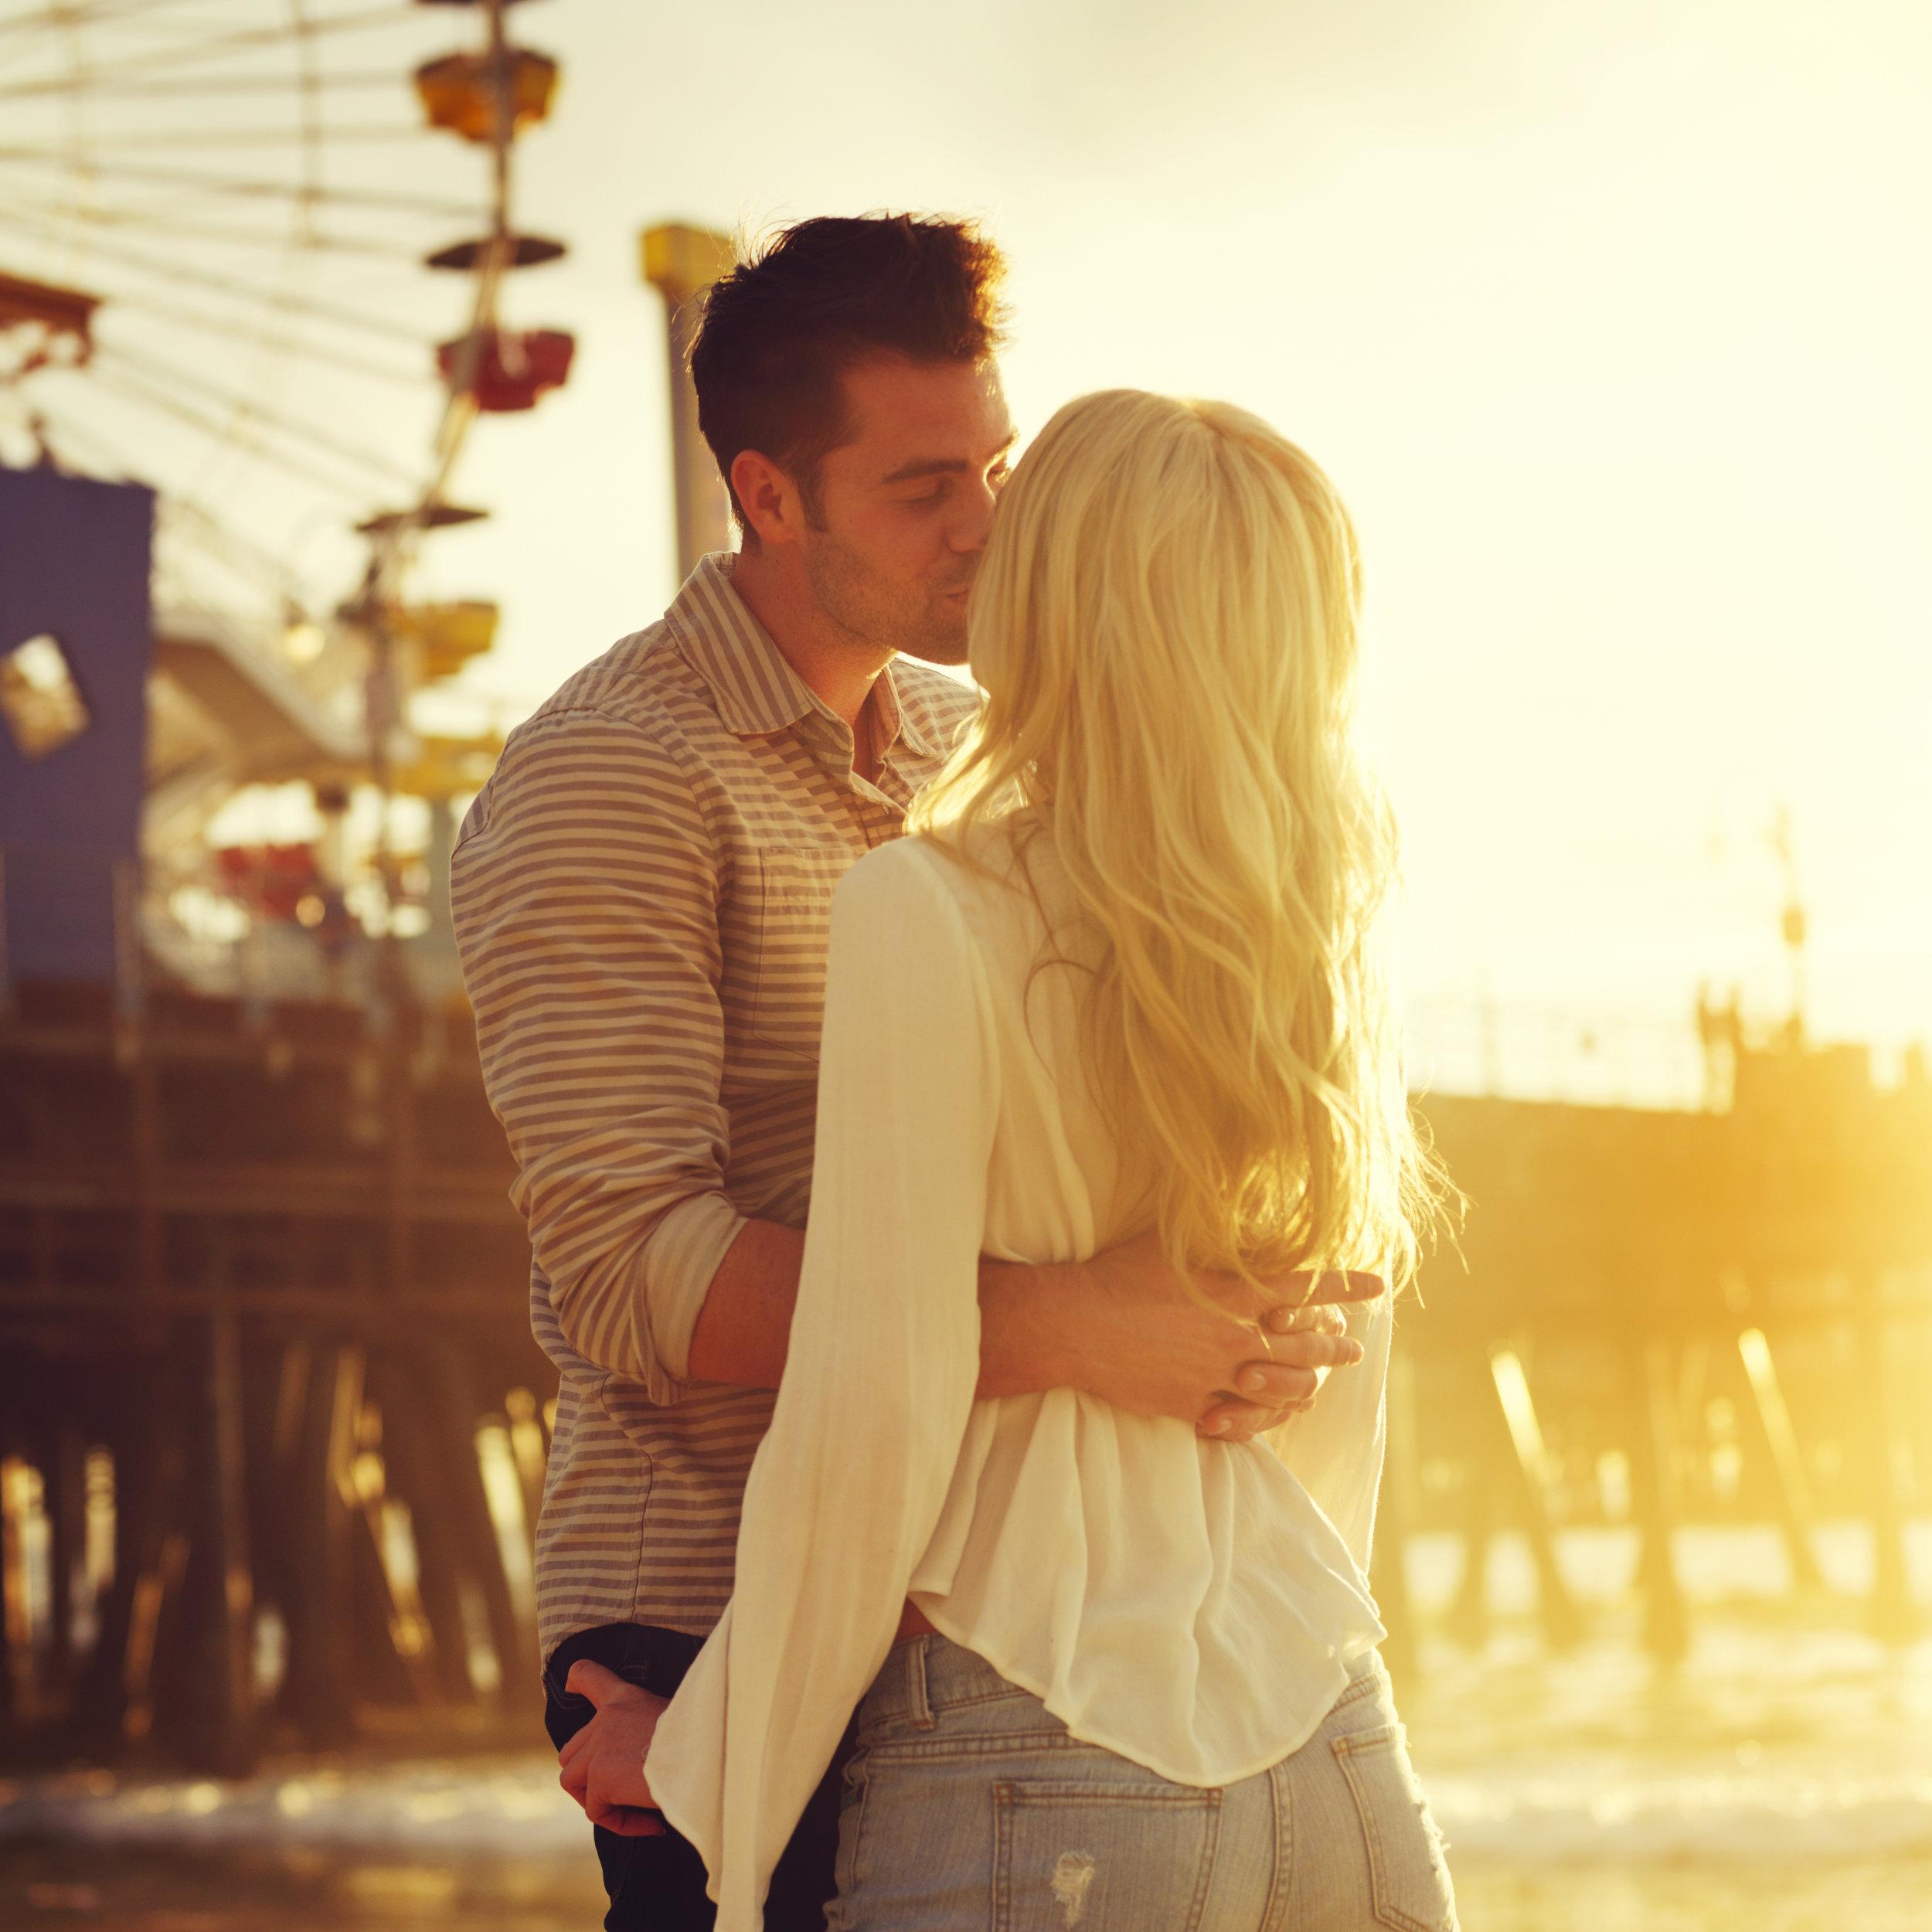 couple kissing at the fair.jpeg